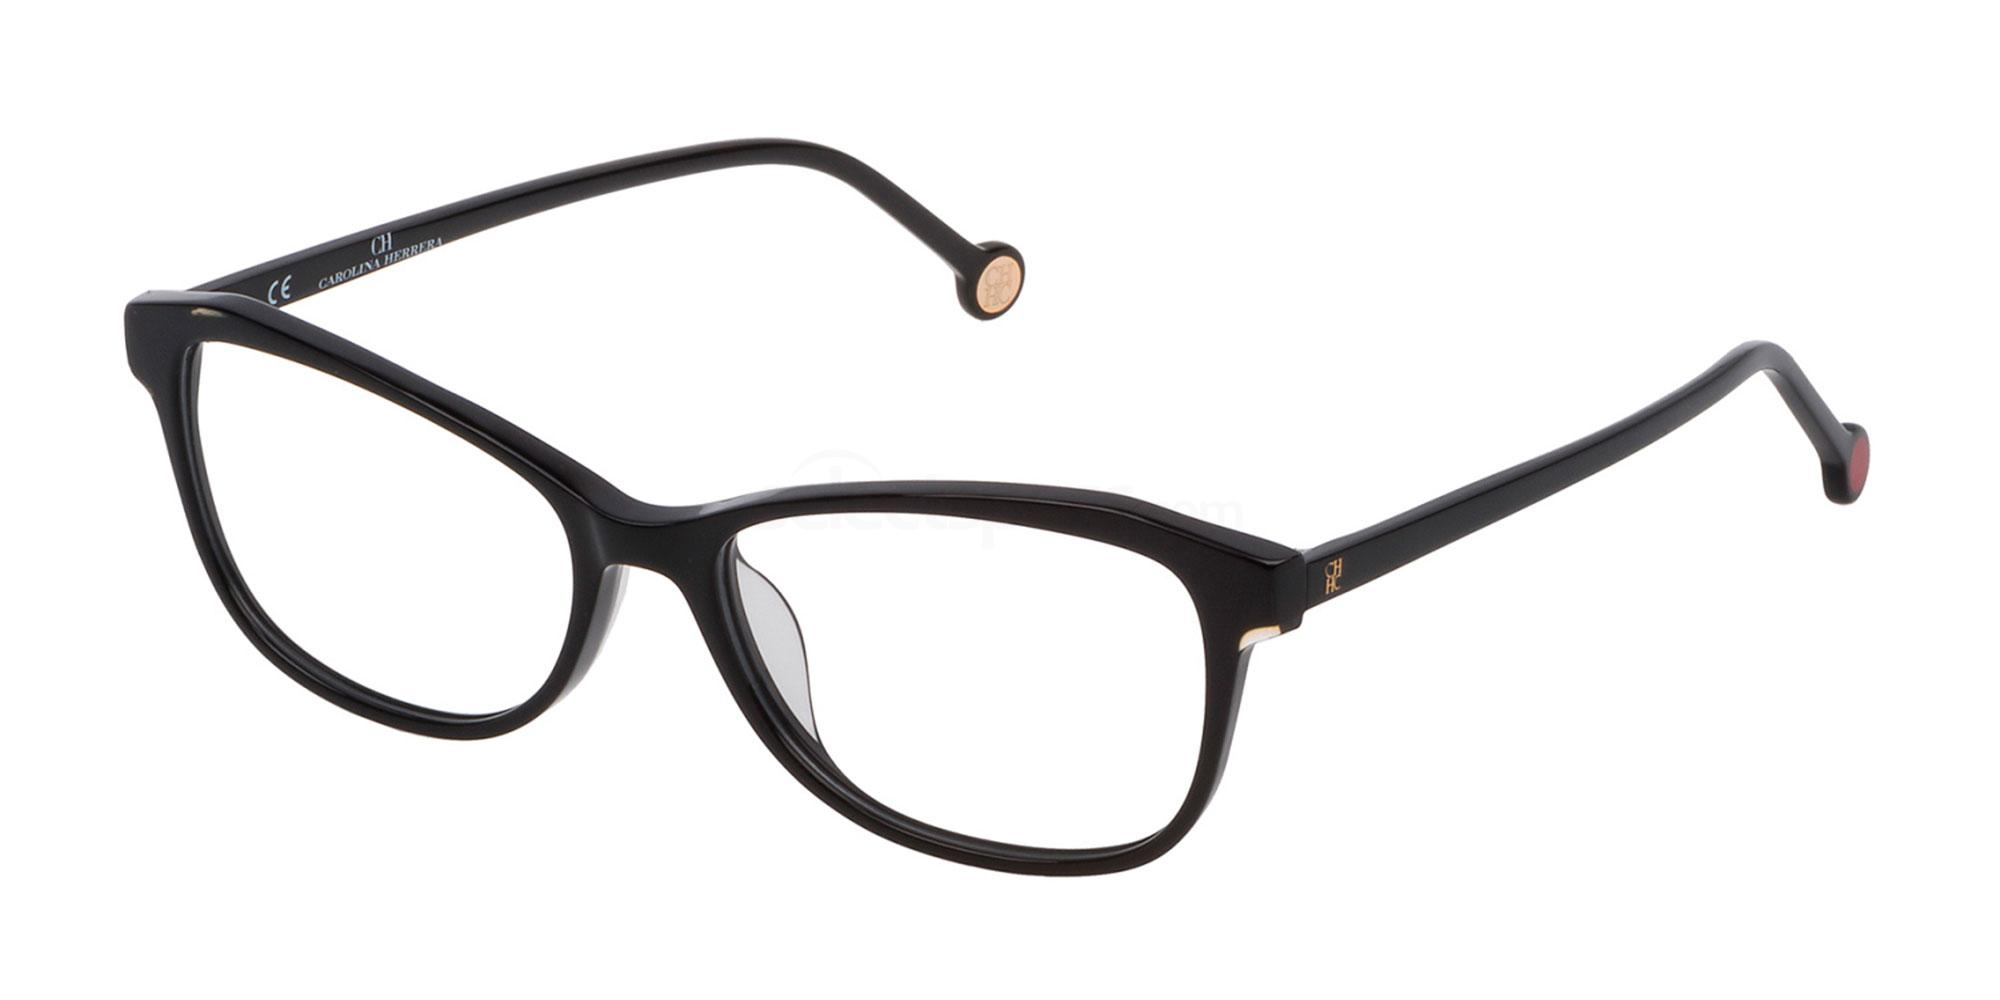 0700 VHE776 Glasses, CH Carolina Herrera